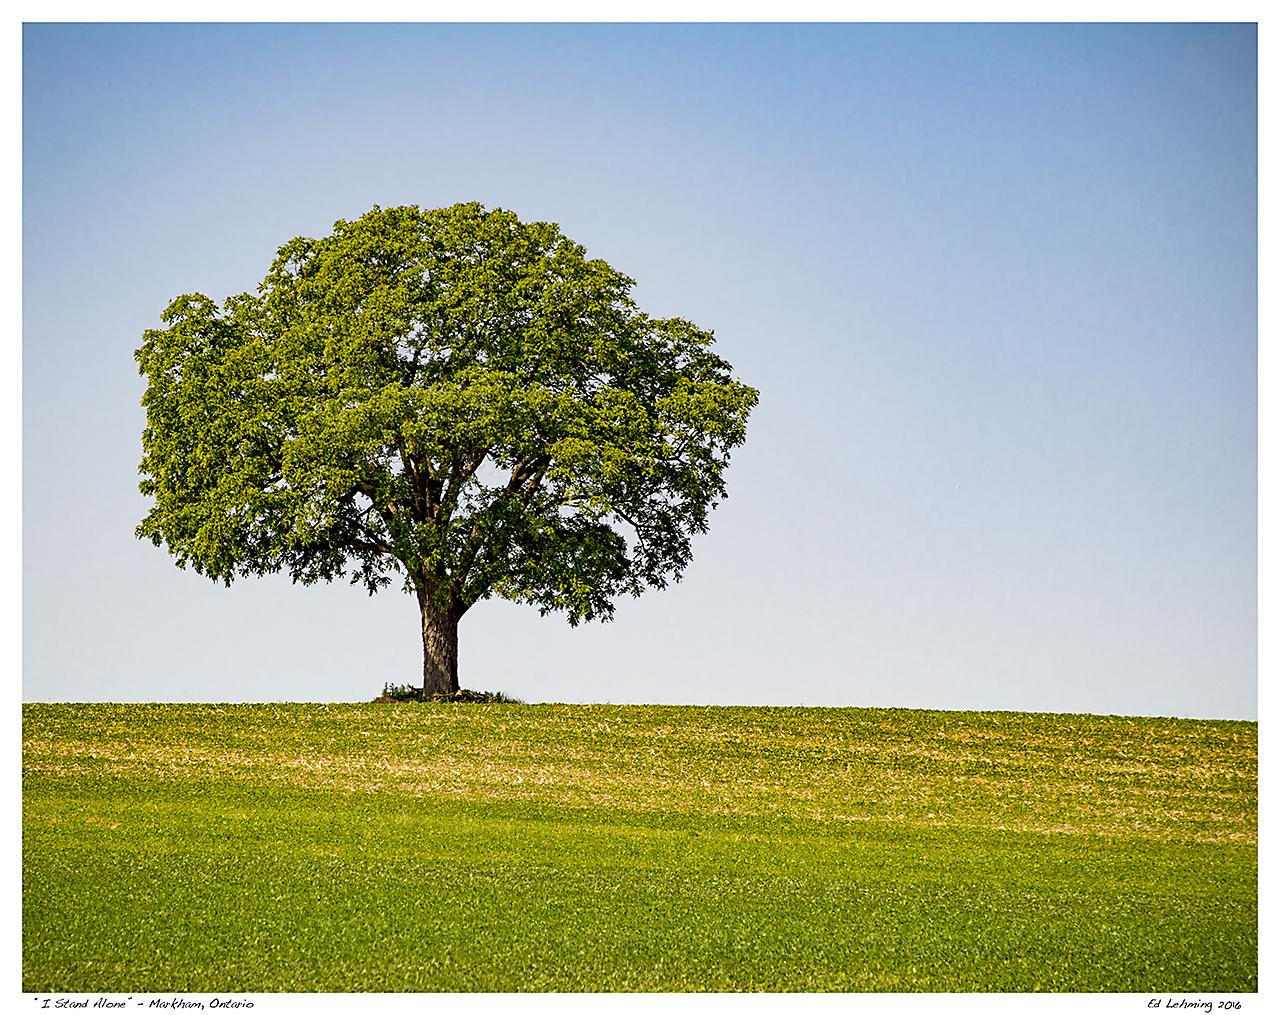 """I Stand Alone"" - Markham, Ontario"